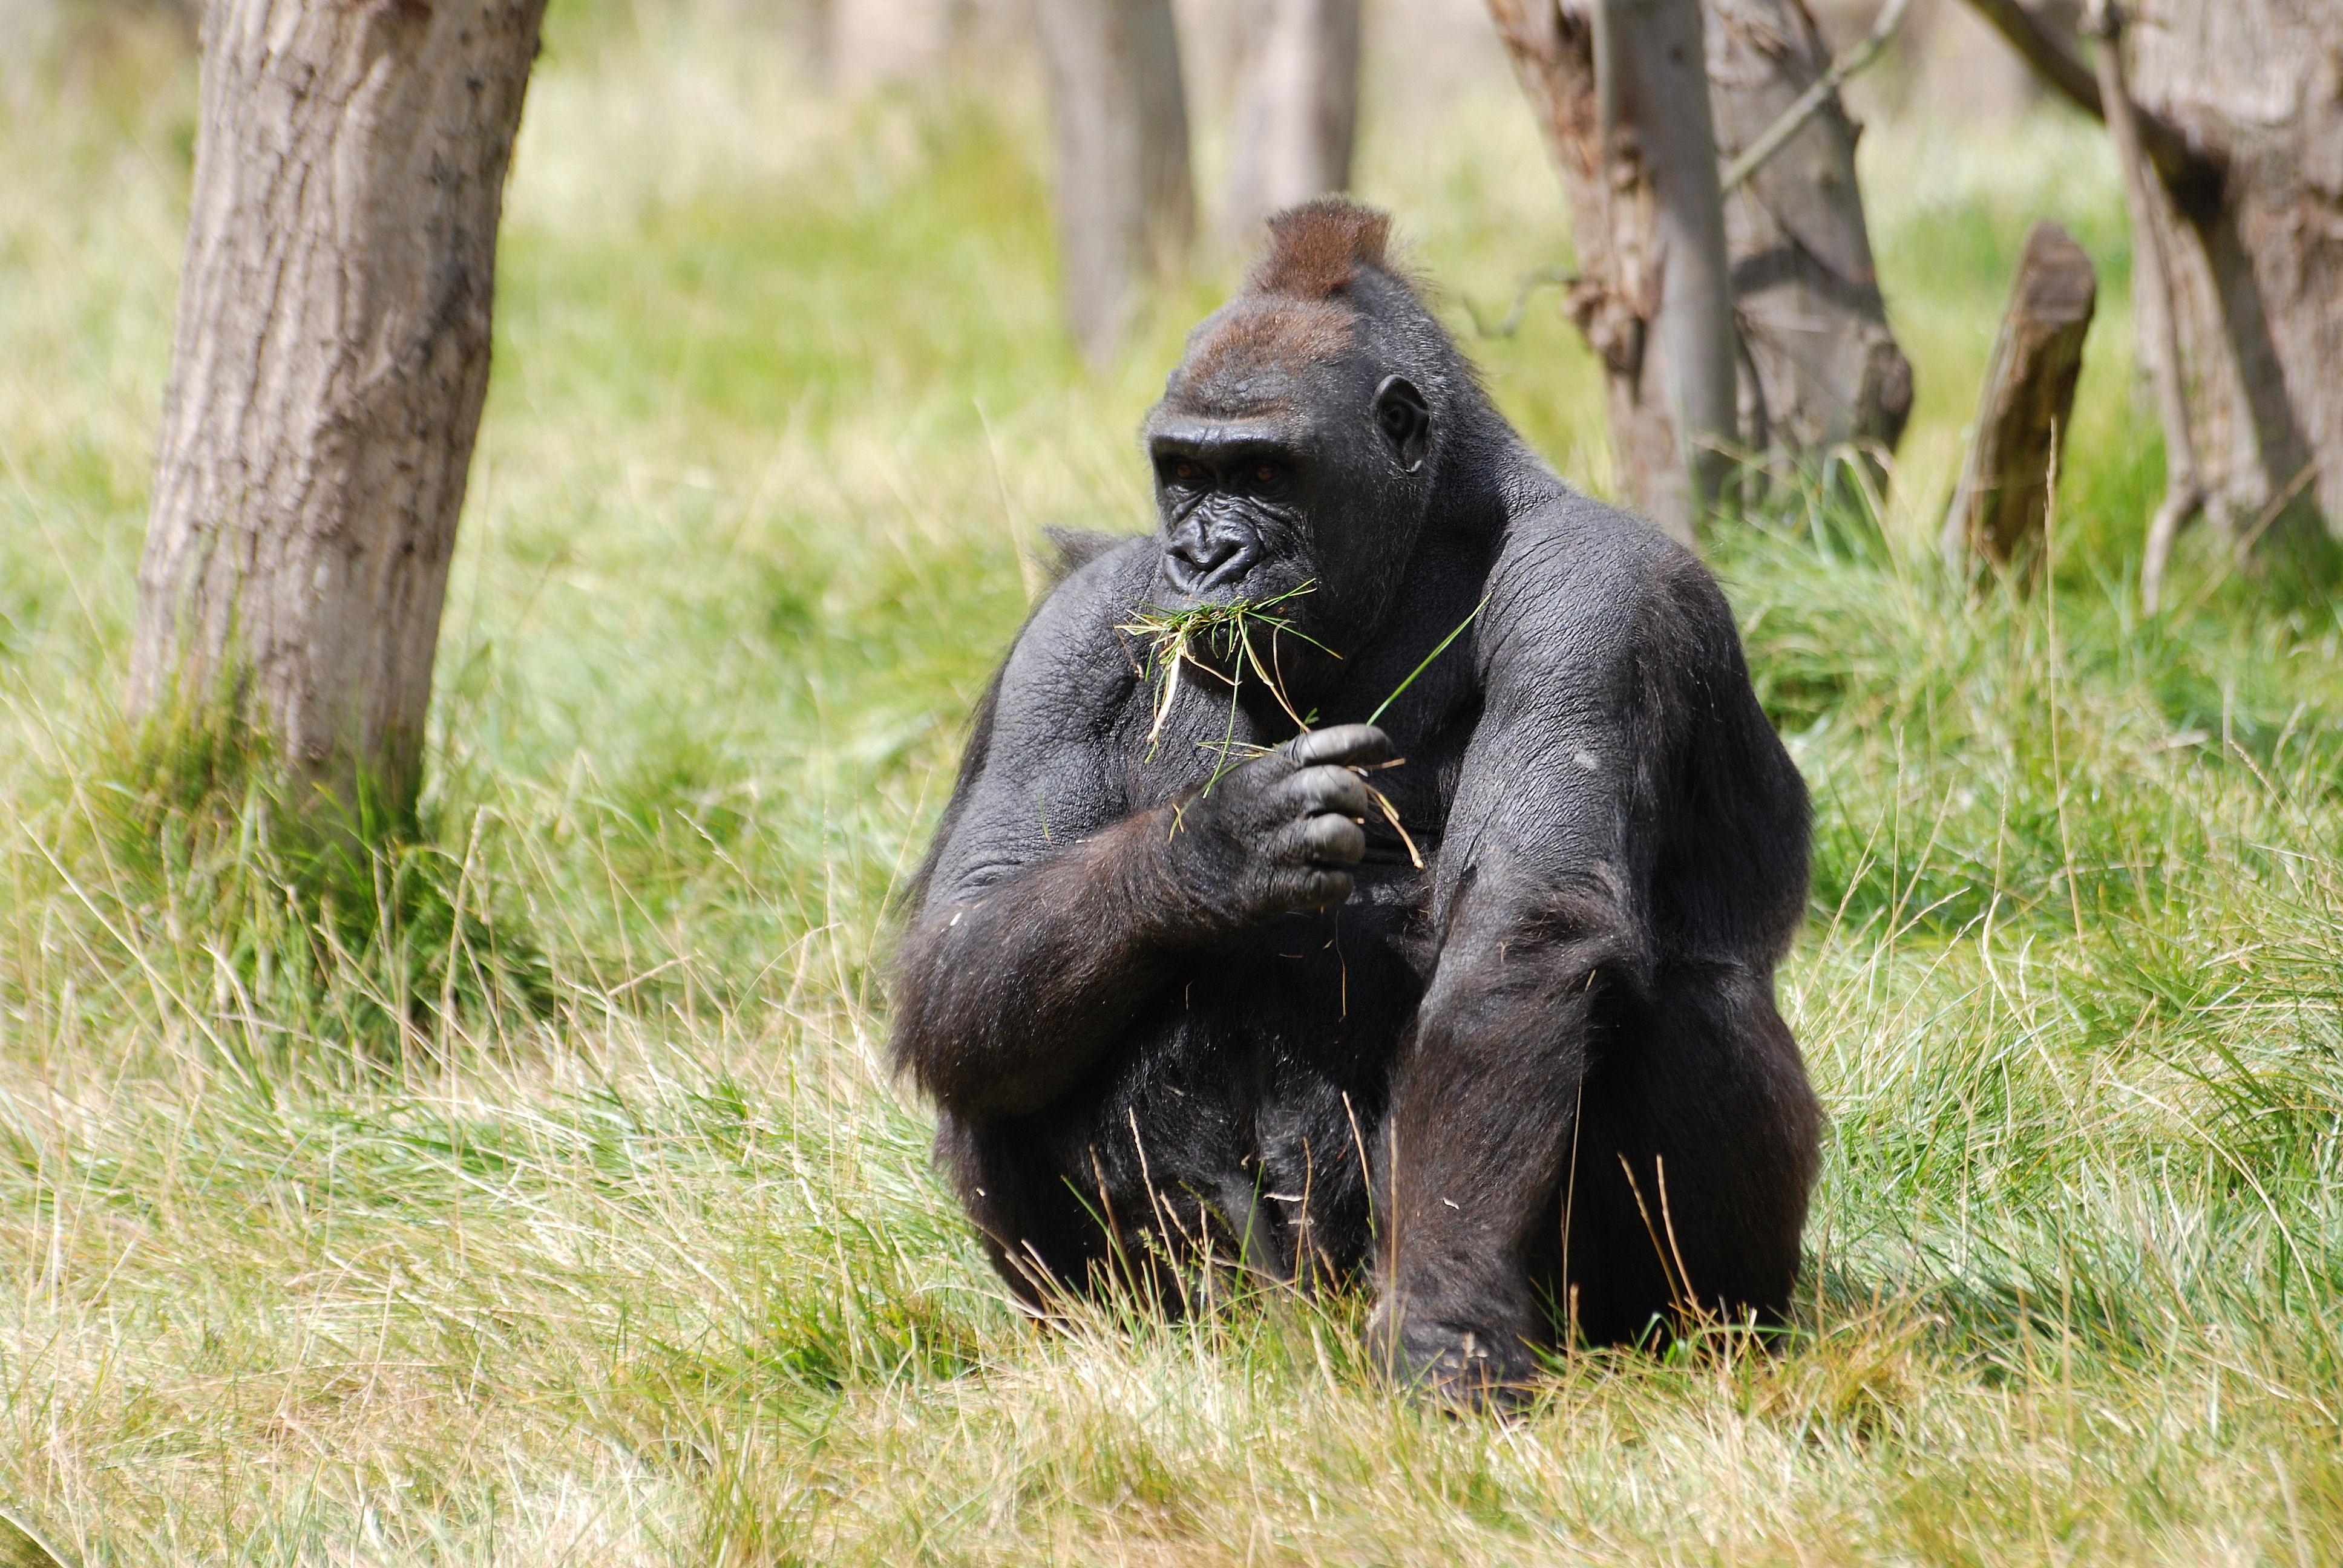 wildlife-zoo-fur-sitting-africa-mammal-b